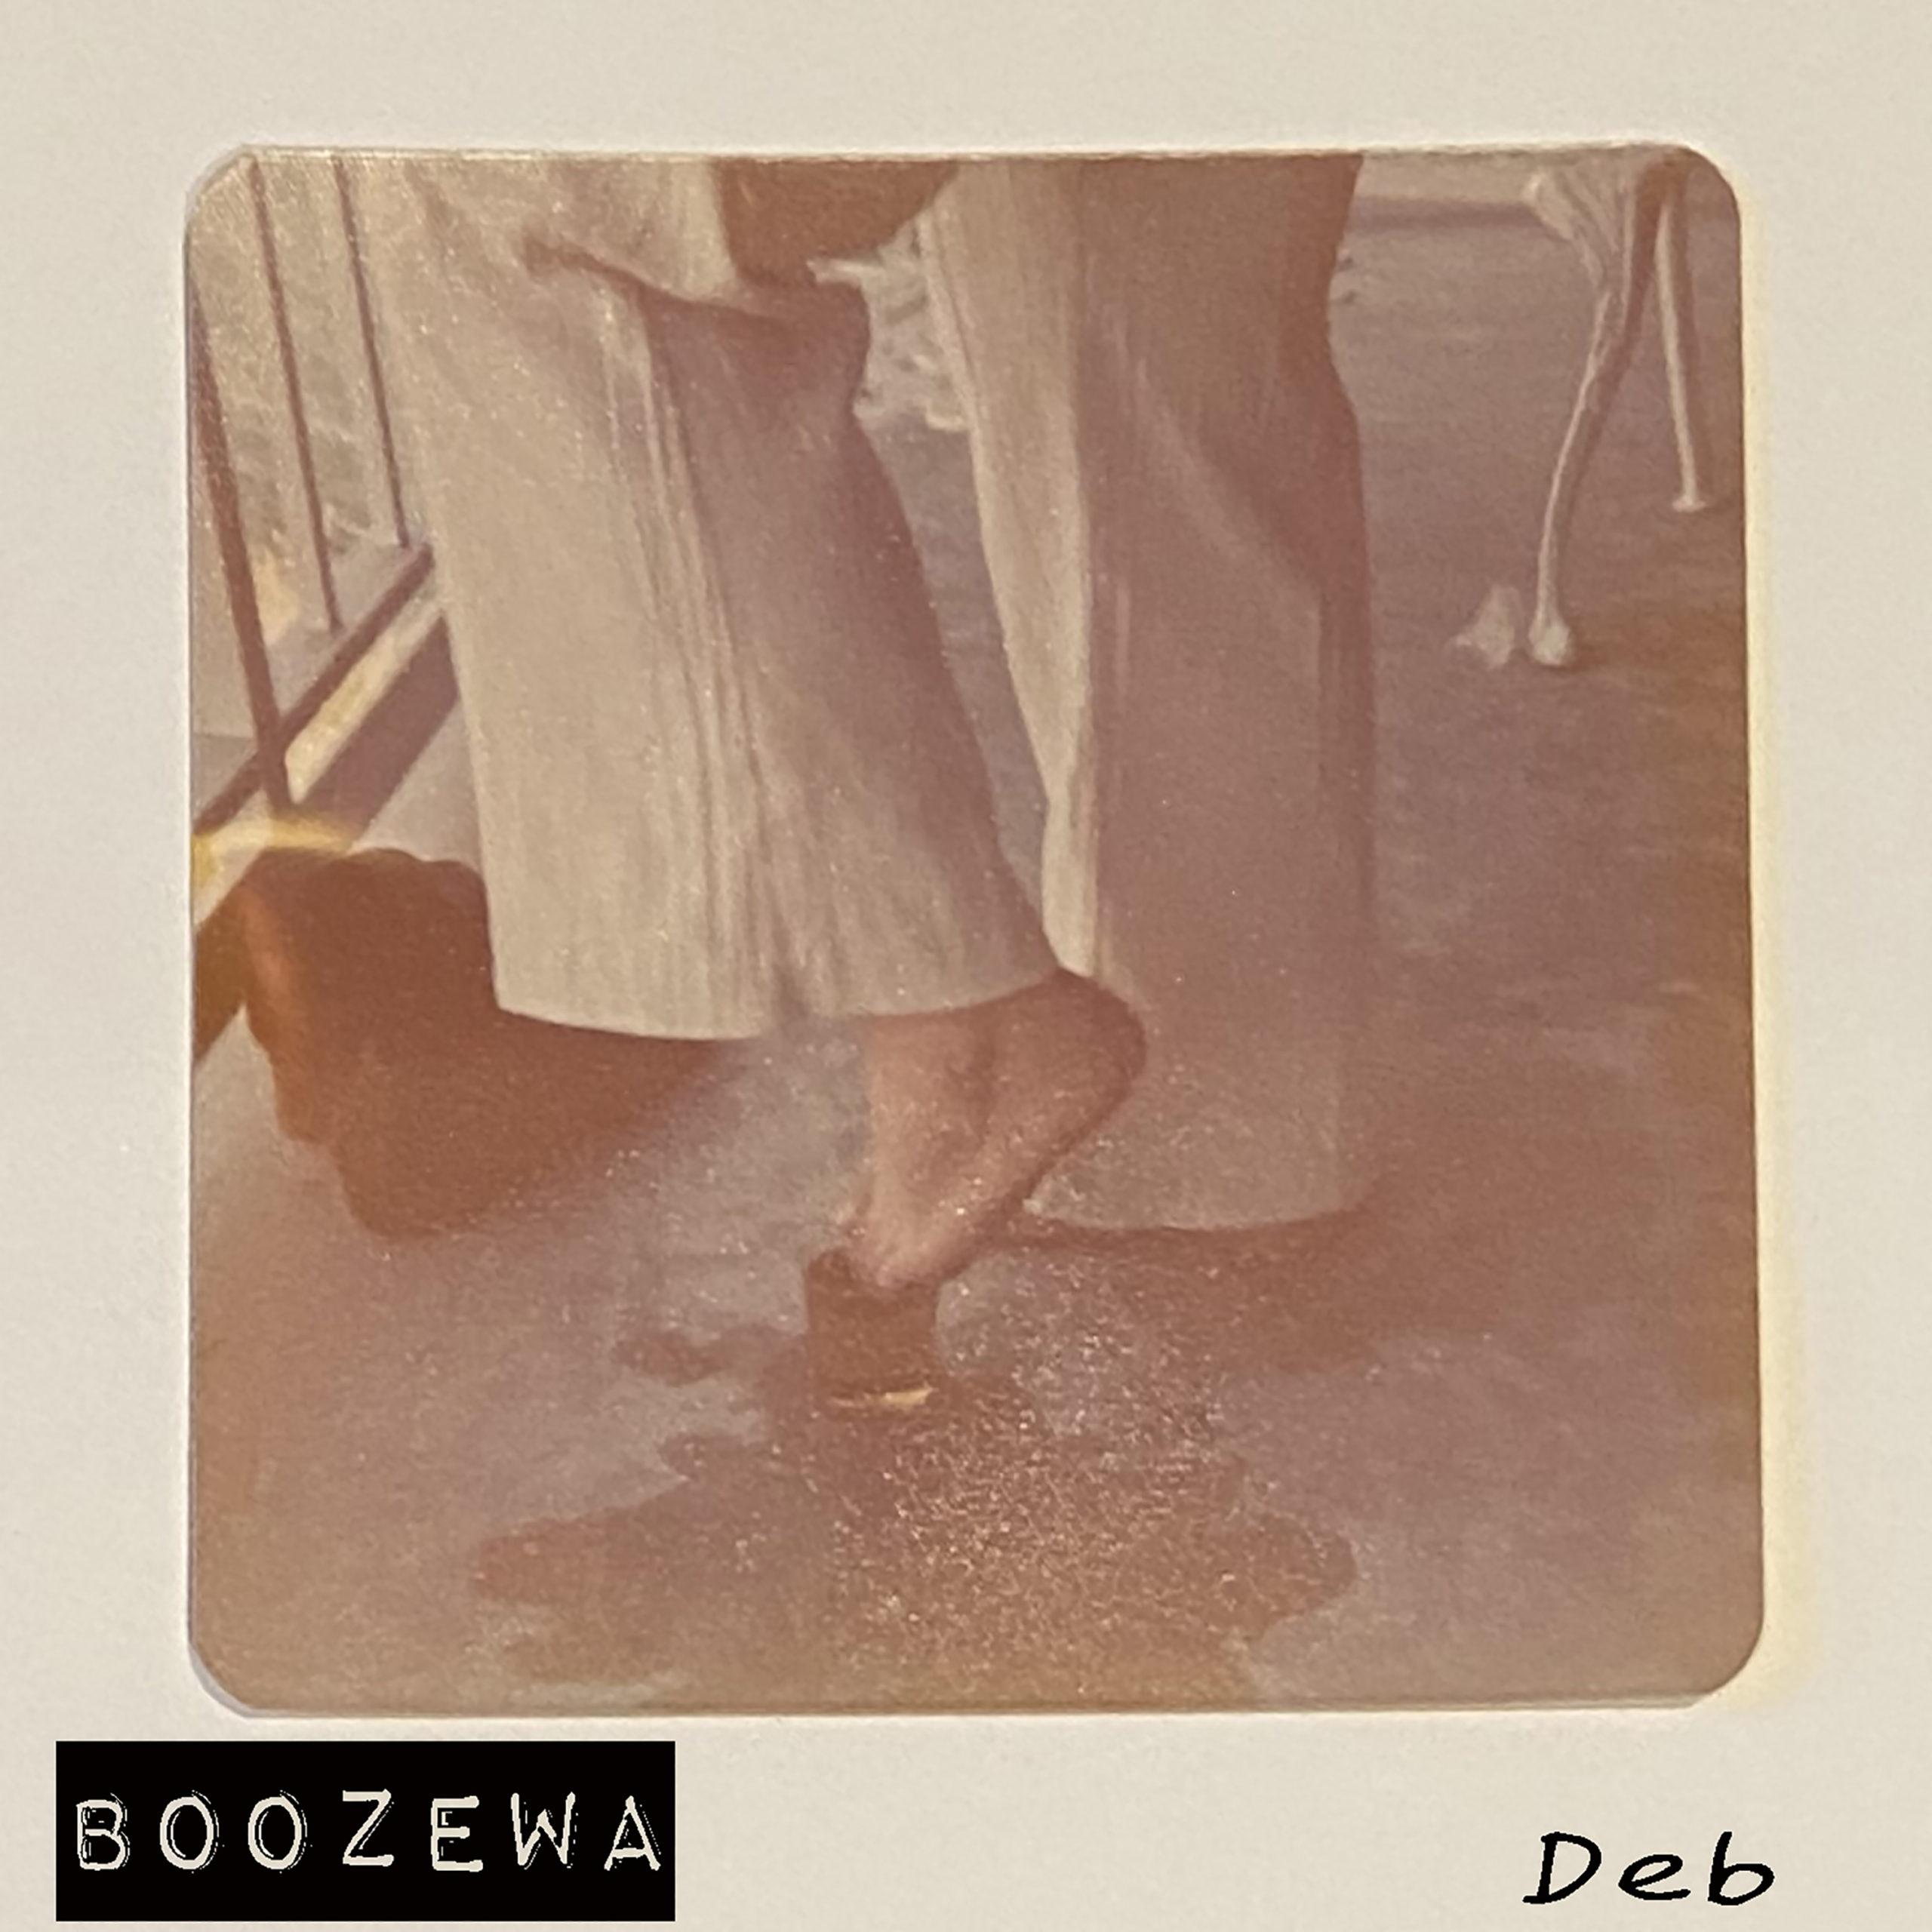 Boozewa Deb